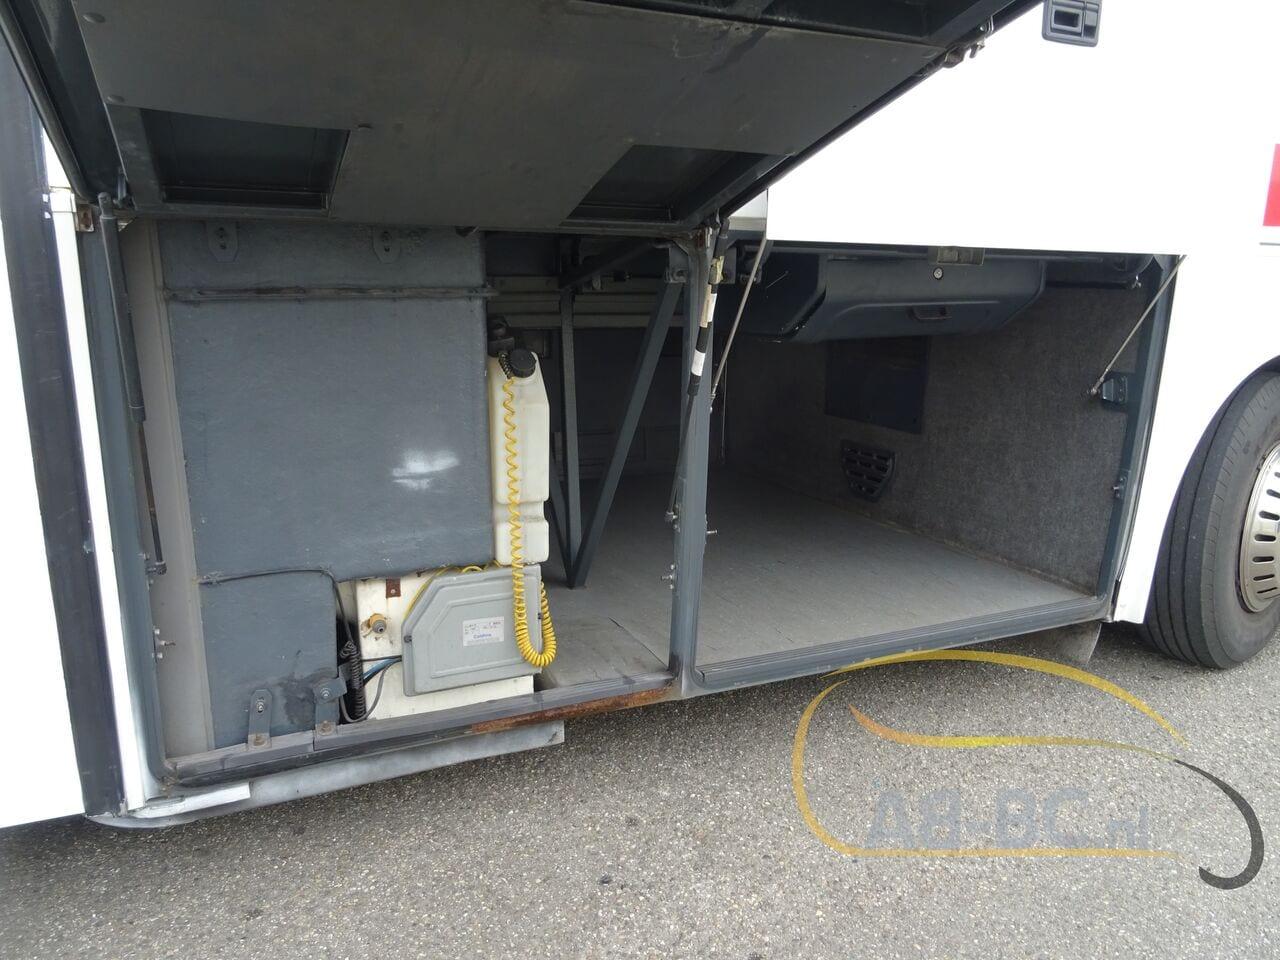 coach-busTEMSA-Safari-HD-51-Seats-EURO5-12-MTR---1614266442180465834_big_3a529fe52bfd44e1ce90881eb2bab51b--19052917224730818200